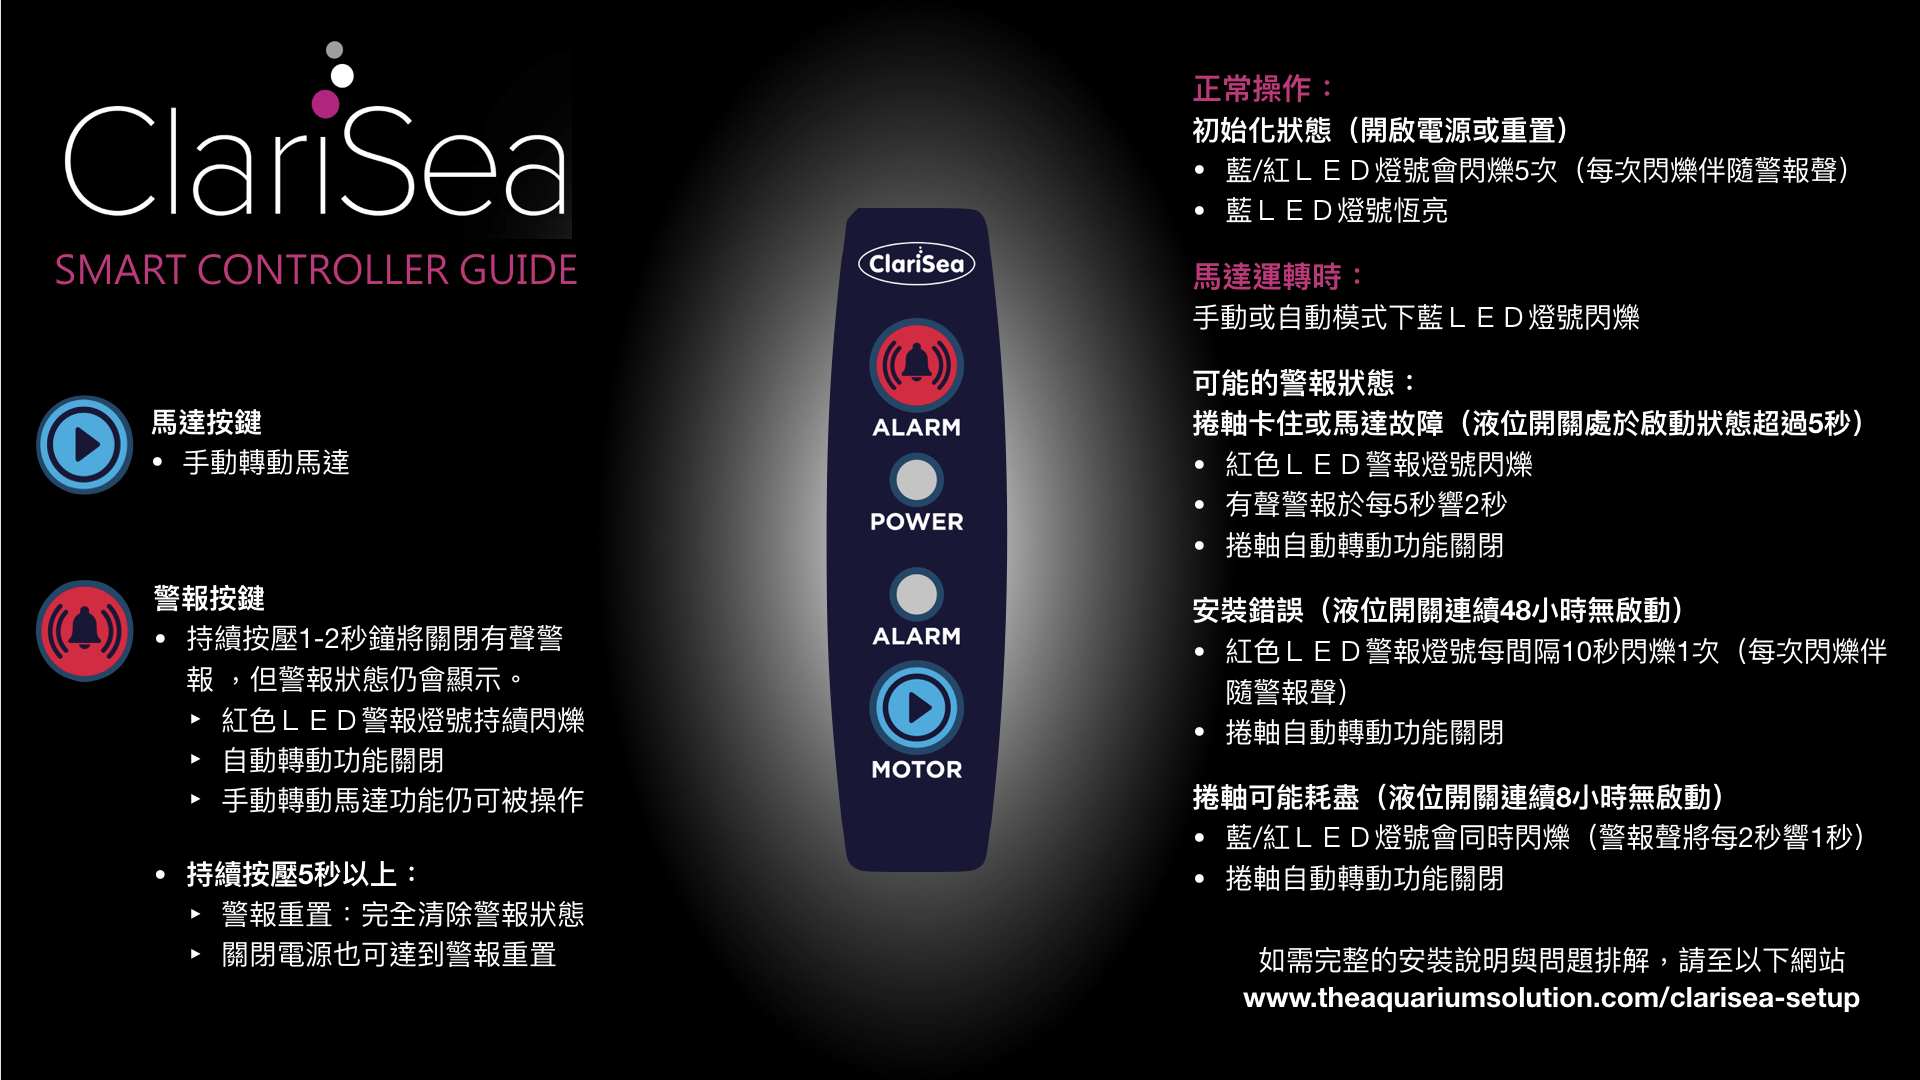 ClariSea Smart Controller Guide(中文版).jpeg